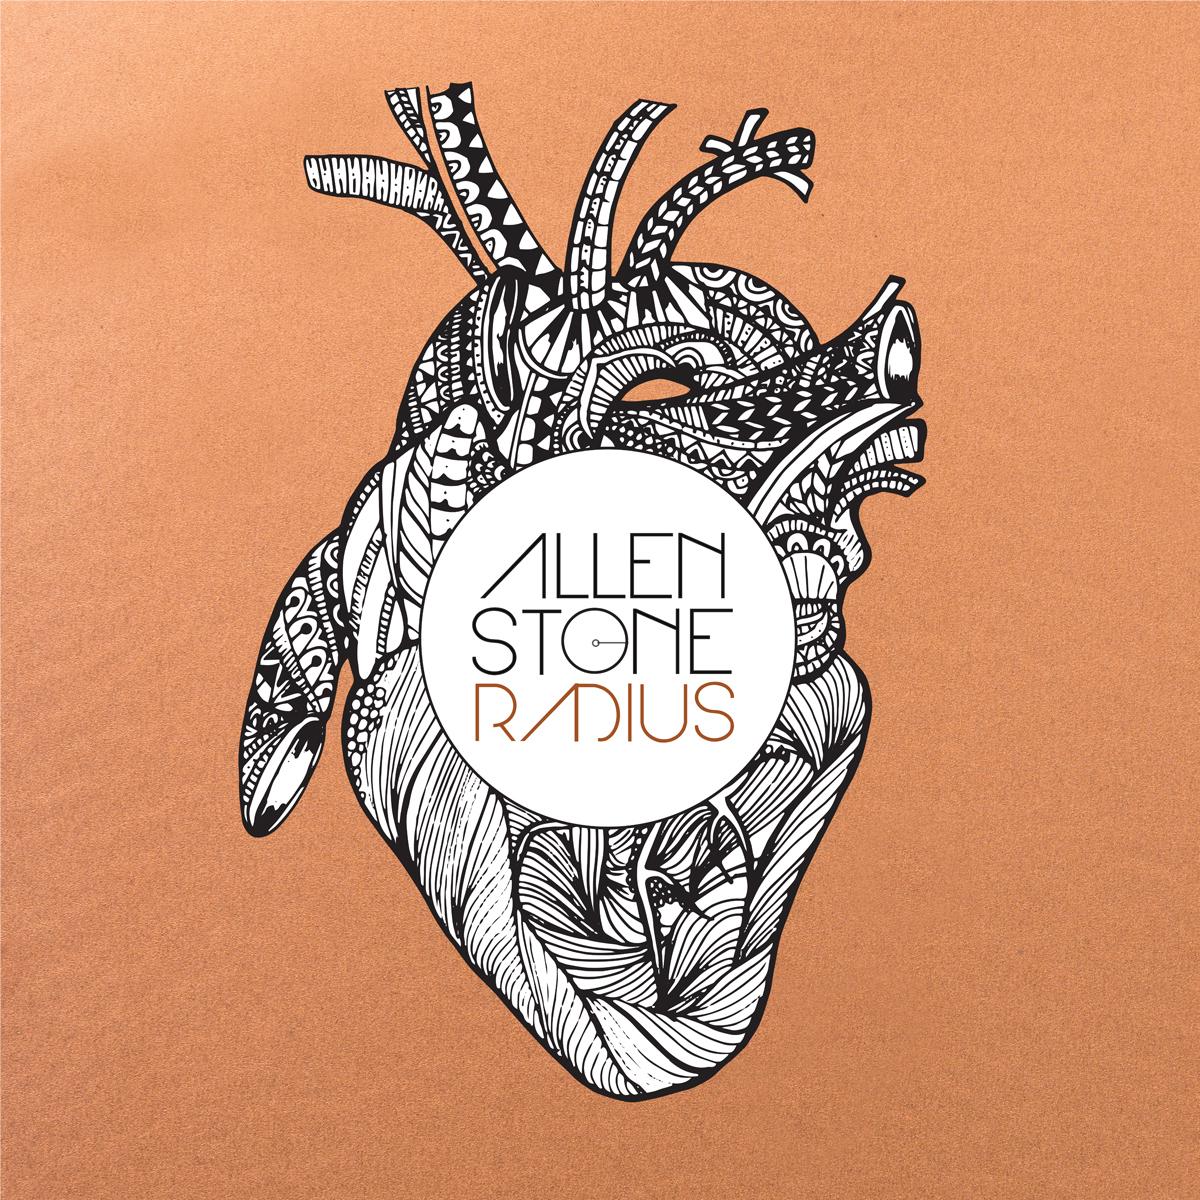 Allen Stone - Radius (Deluxe Edition) Download